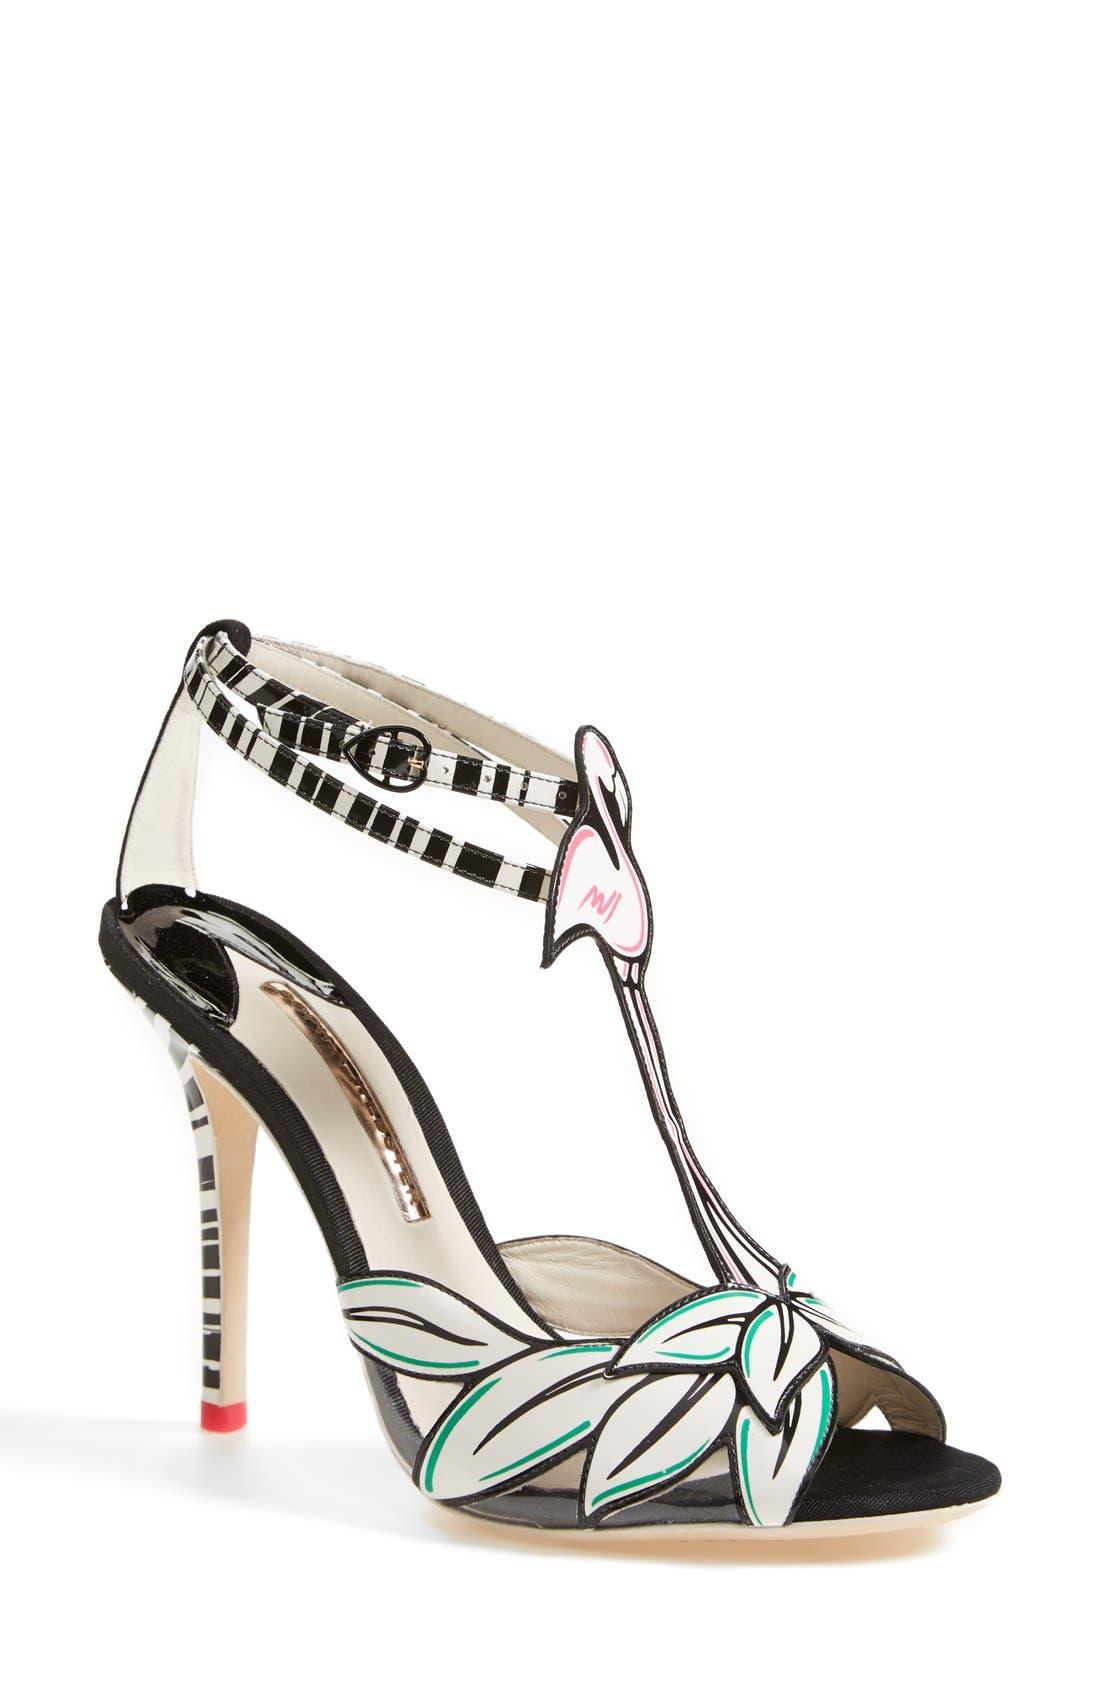 Alternate Image 1 Selected - Sophia Webster 'Flamingo' T-Strap Leather Sandal (Women)